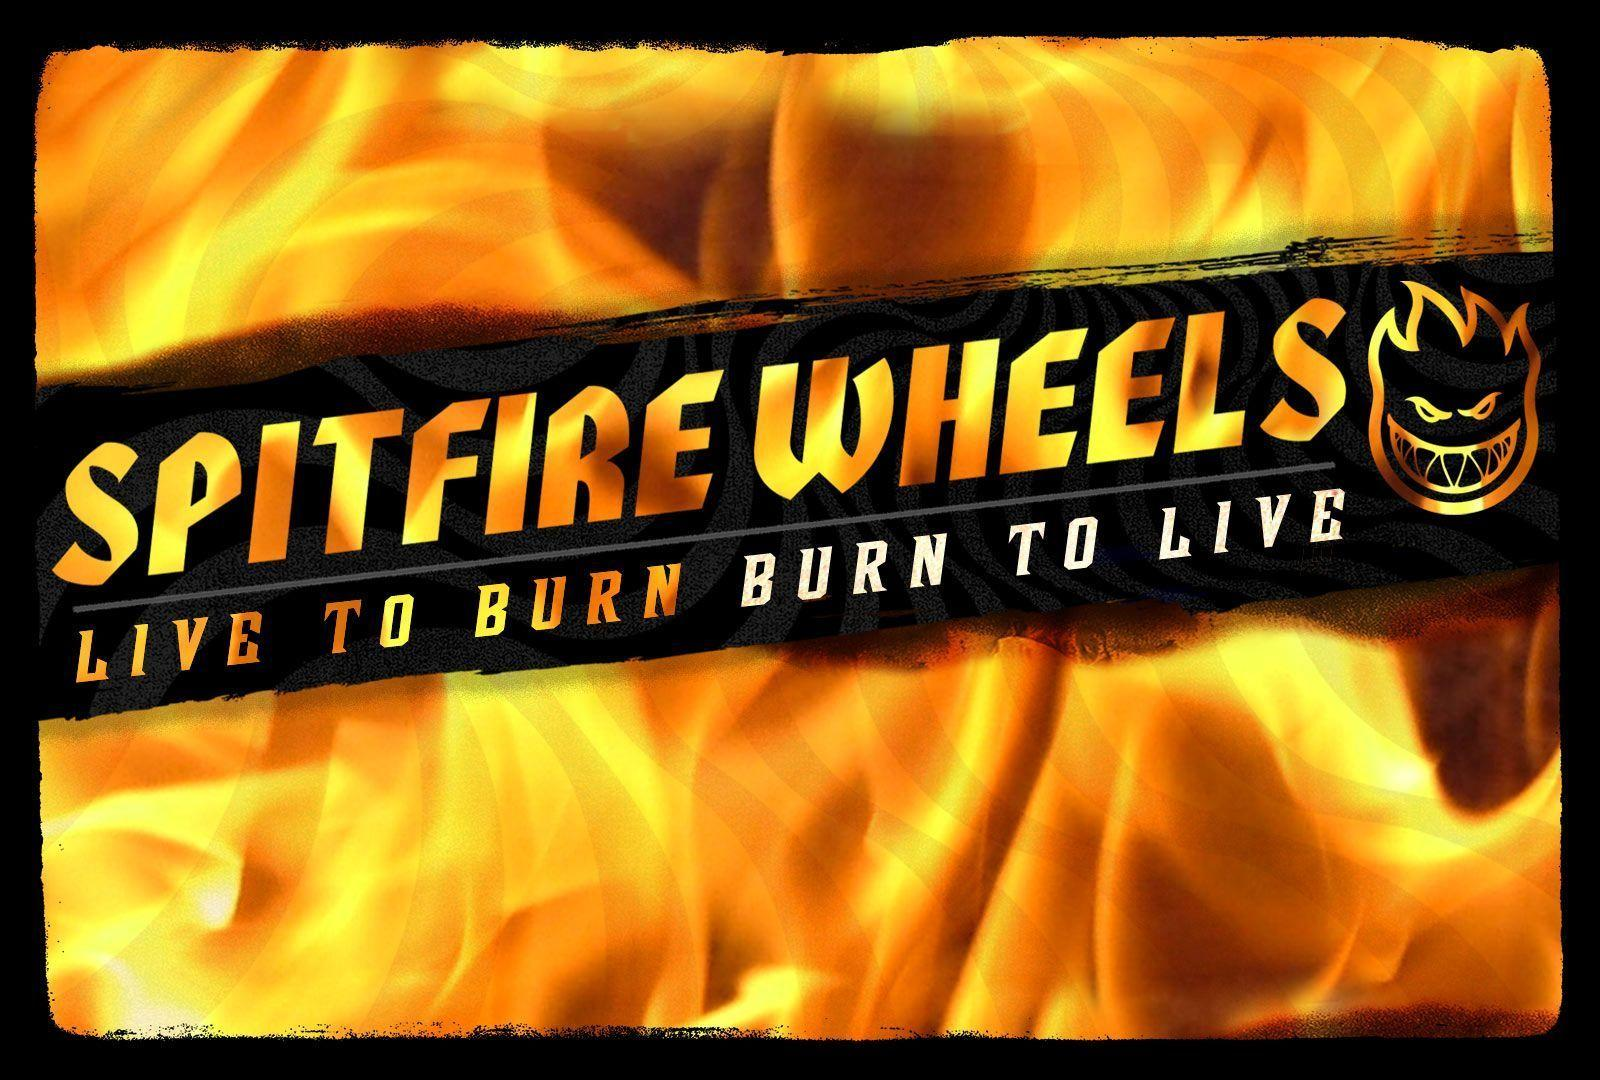 Spitfire Wheels Wallpapers 1600x1080